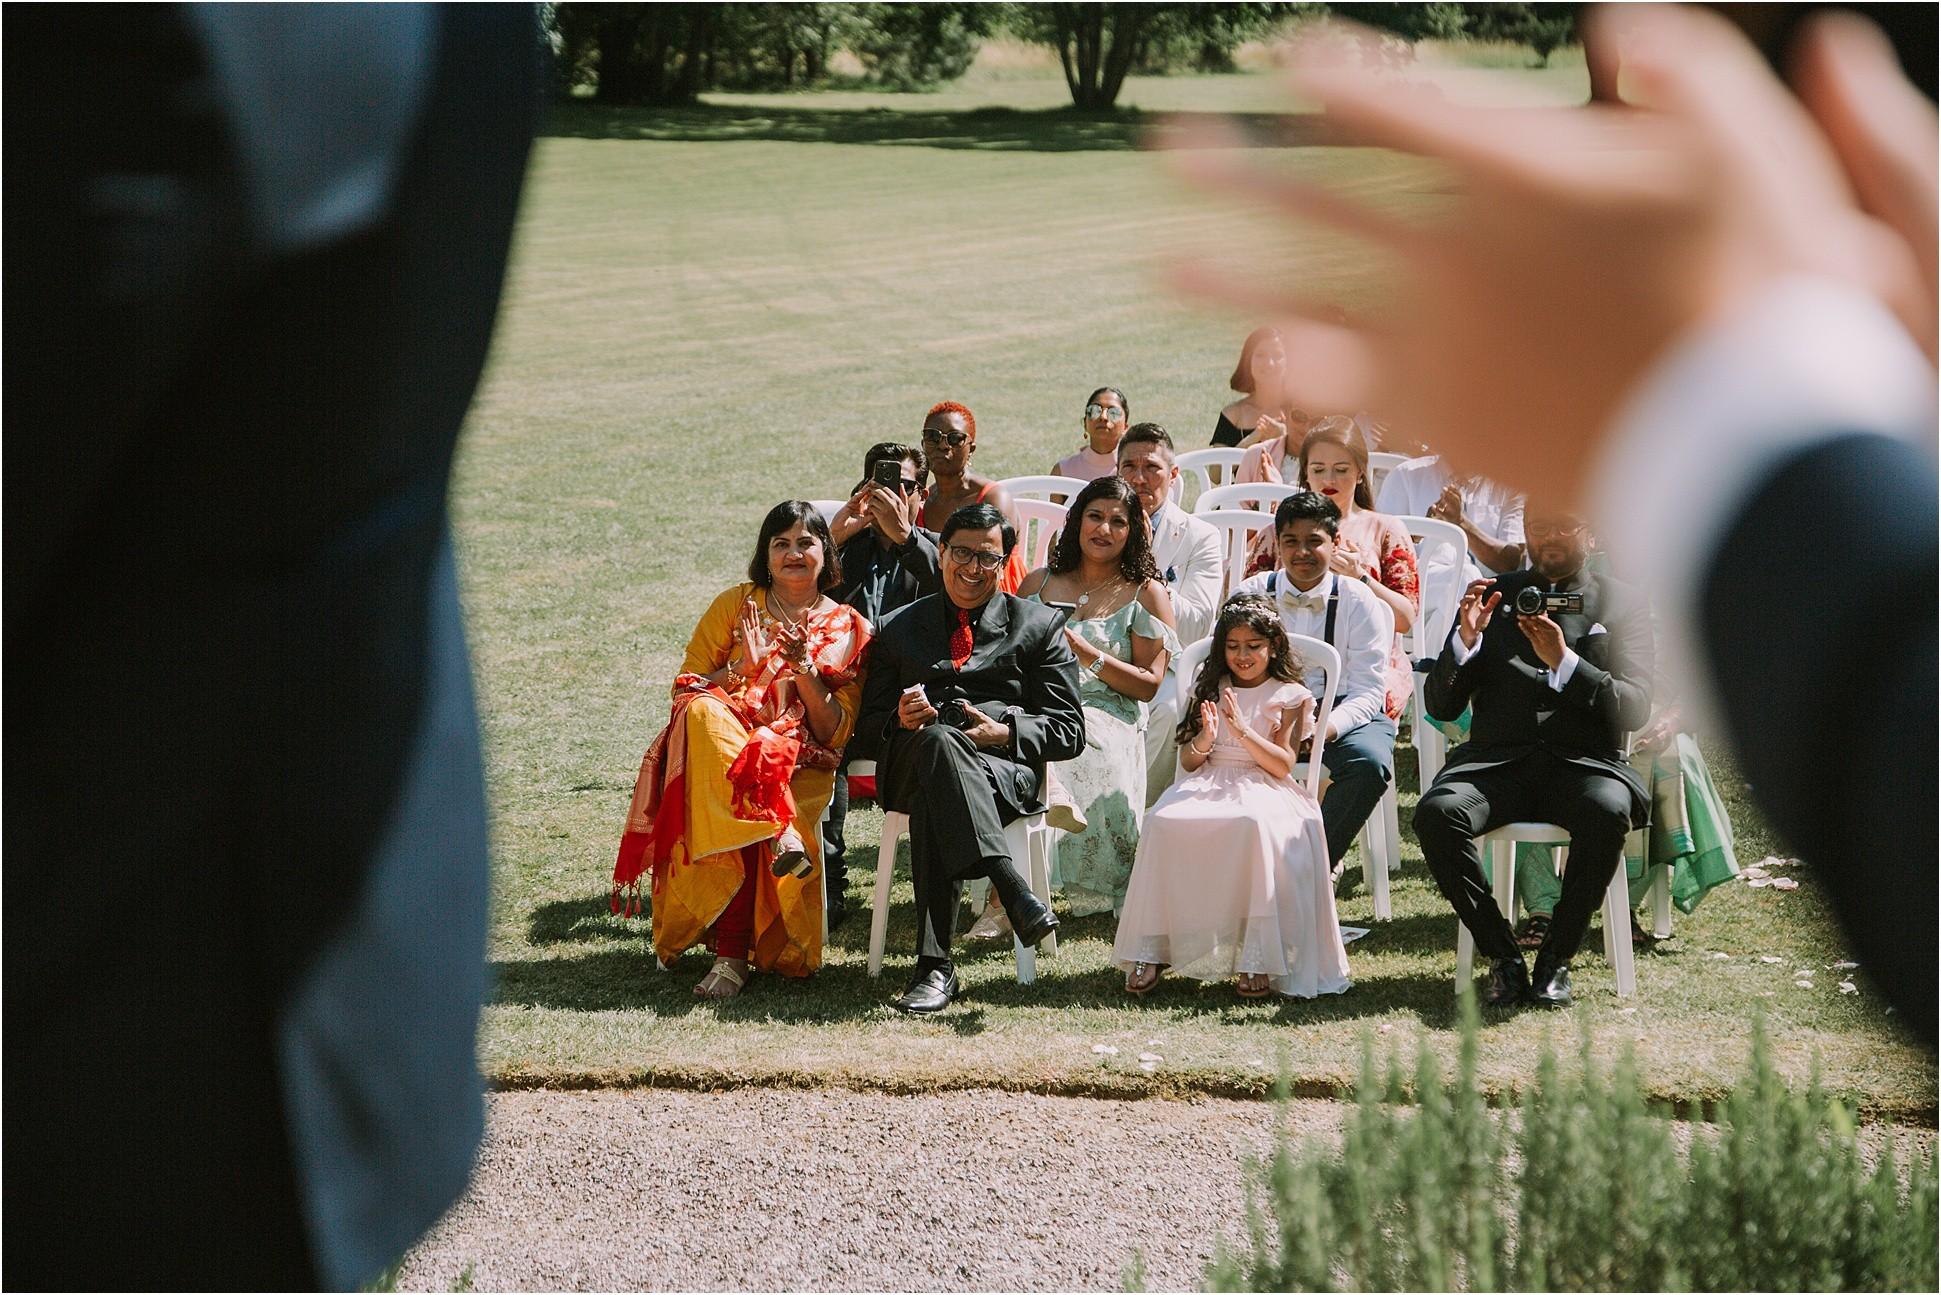 Kateryna-photos-photographe-mariage-chateau-st-paterne-mayenne-normandie_0120.jpg